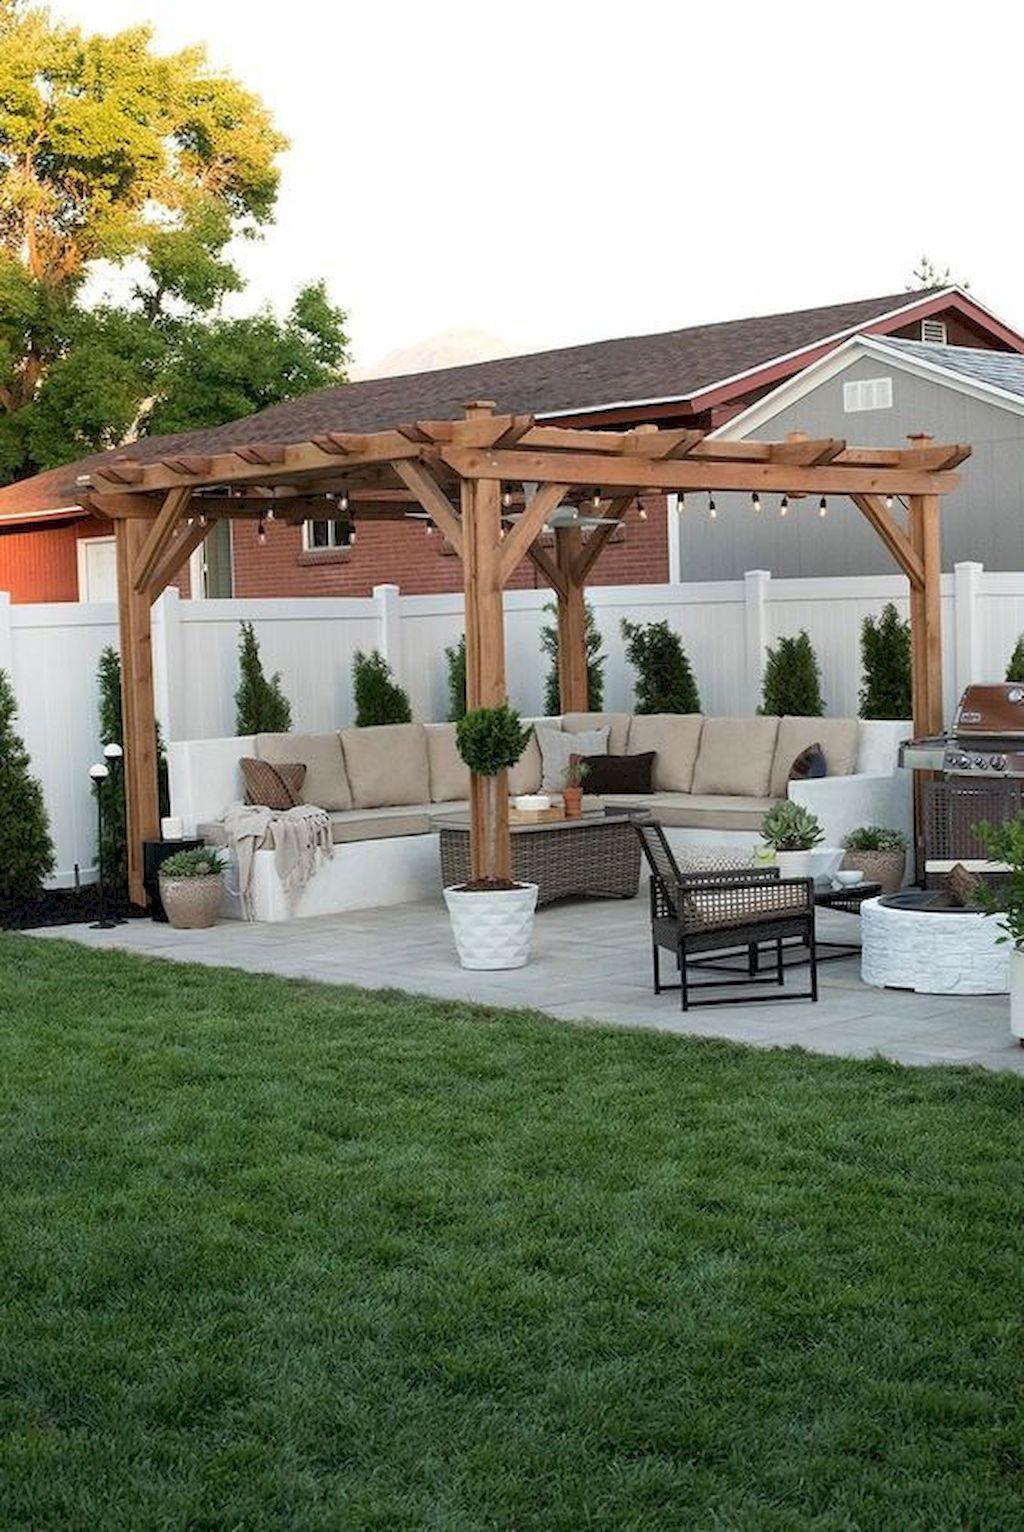 85 Marvelous Backyard Privacy Fence Decor Ideas on A Budget - HomeIdeas.co